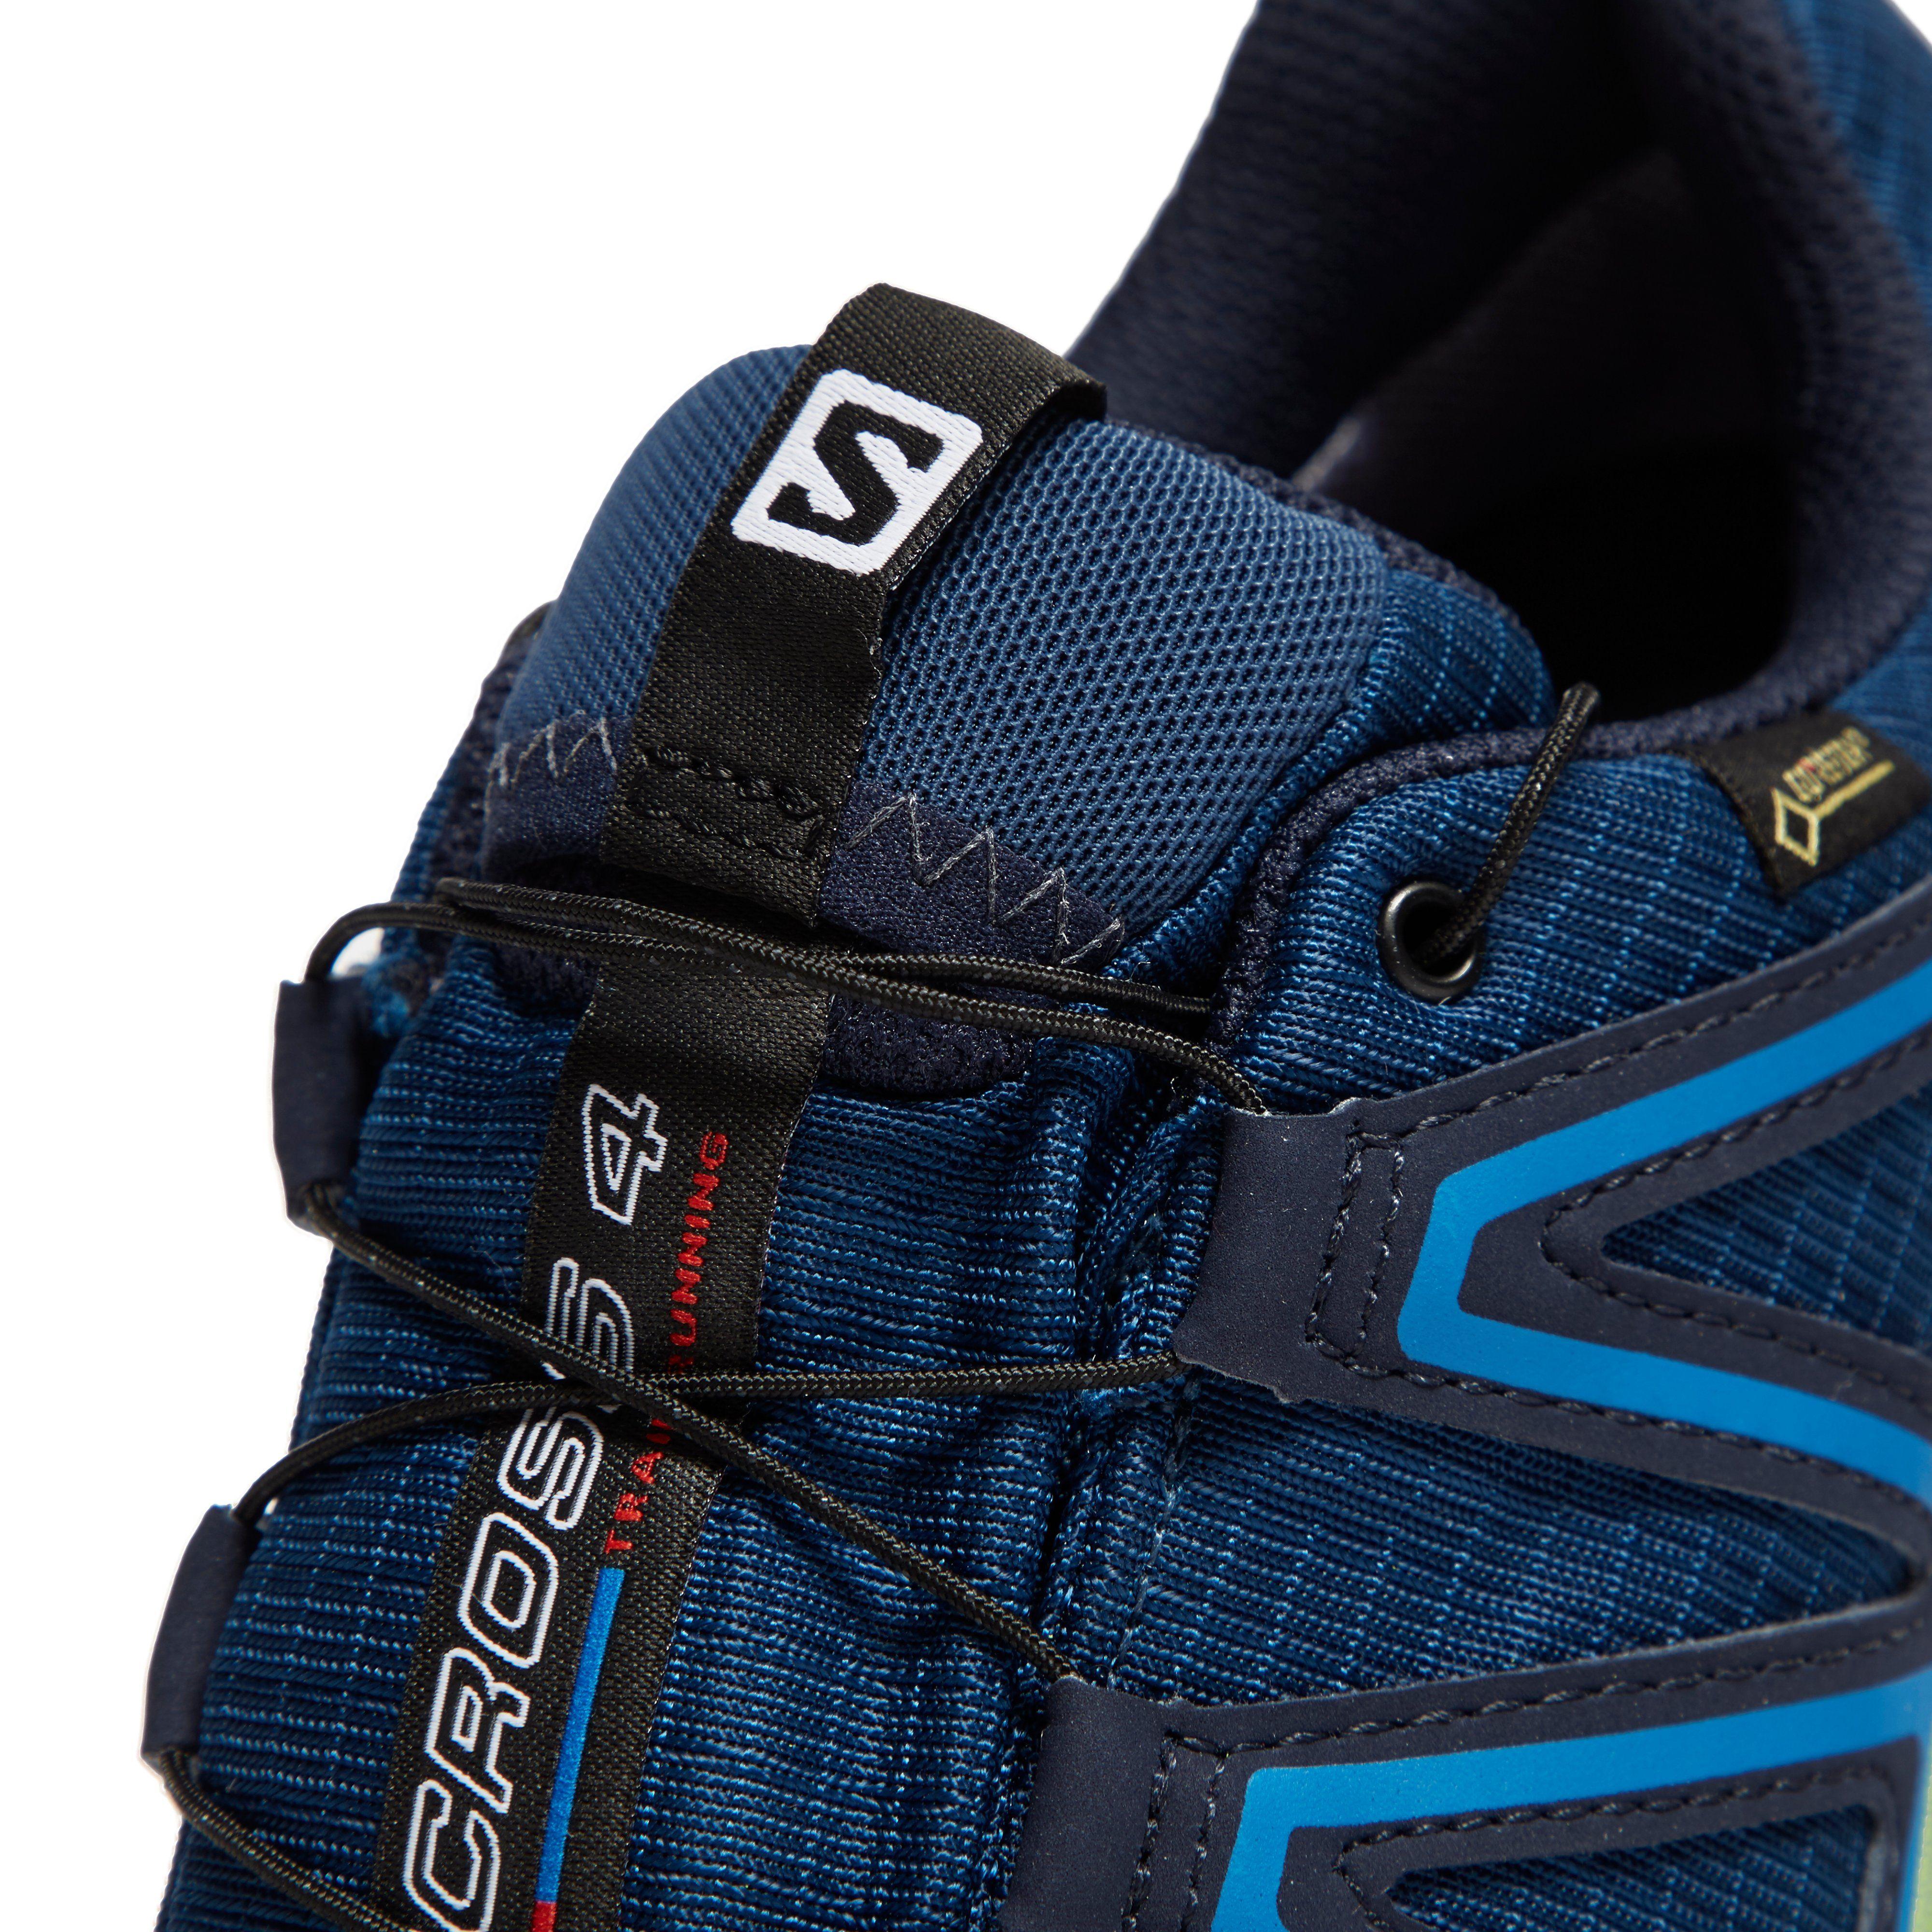 Salomon Speedcross 4 GTX Men's Trail Running Shoes